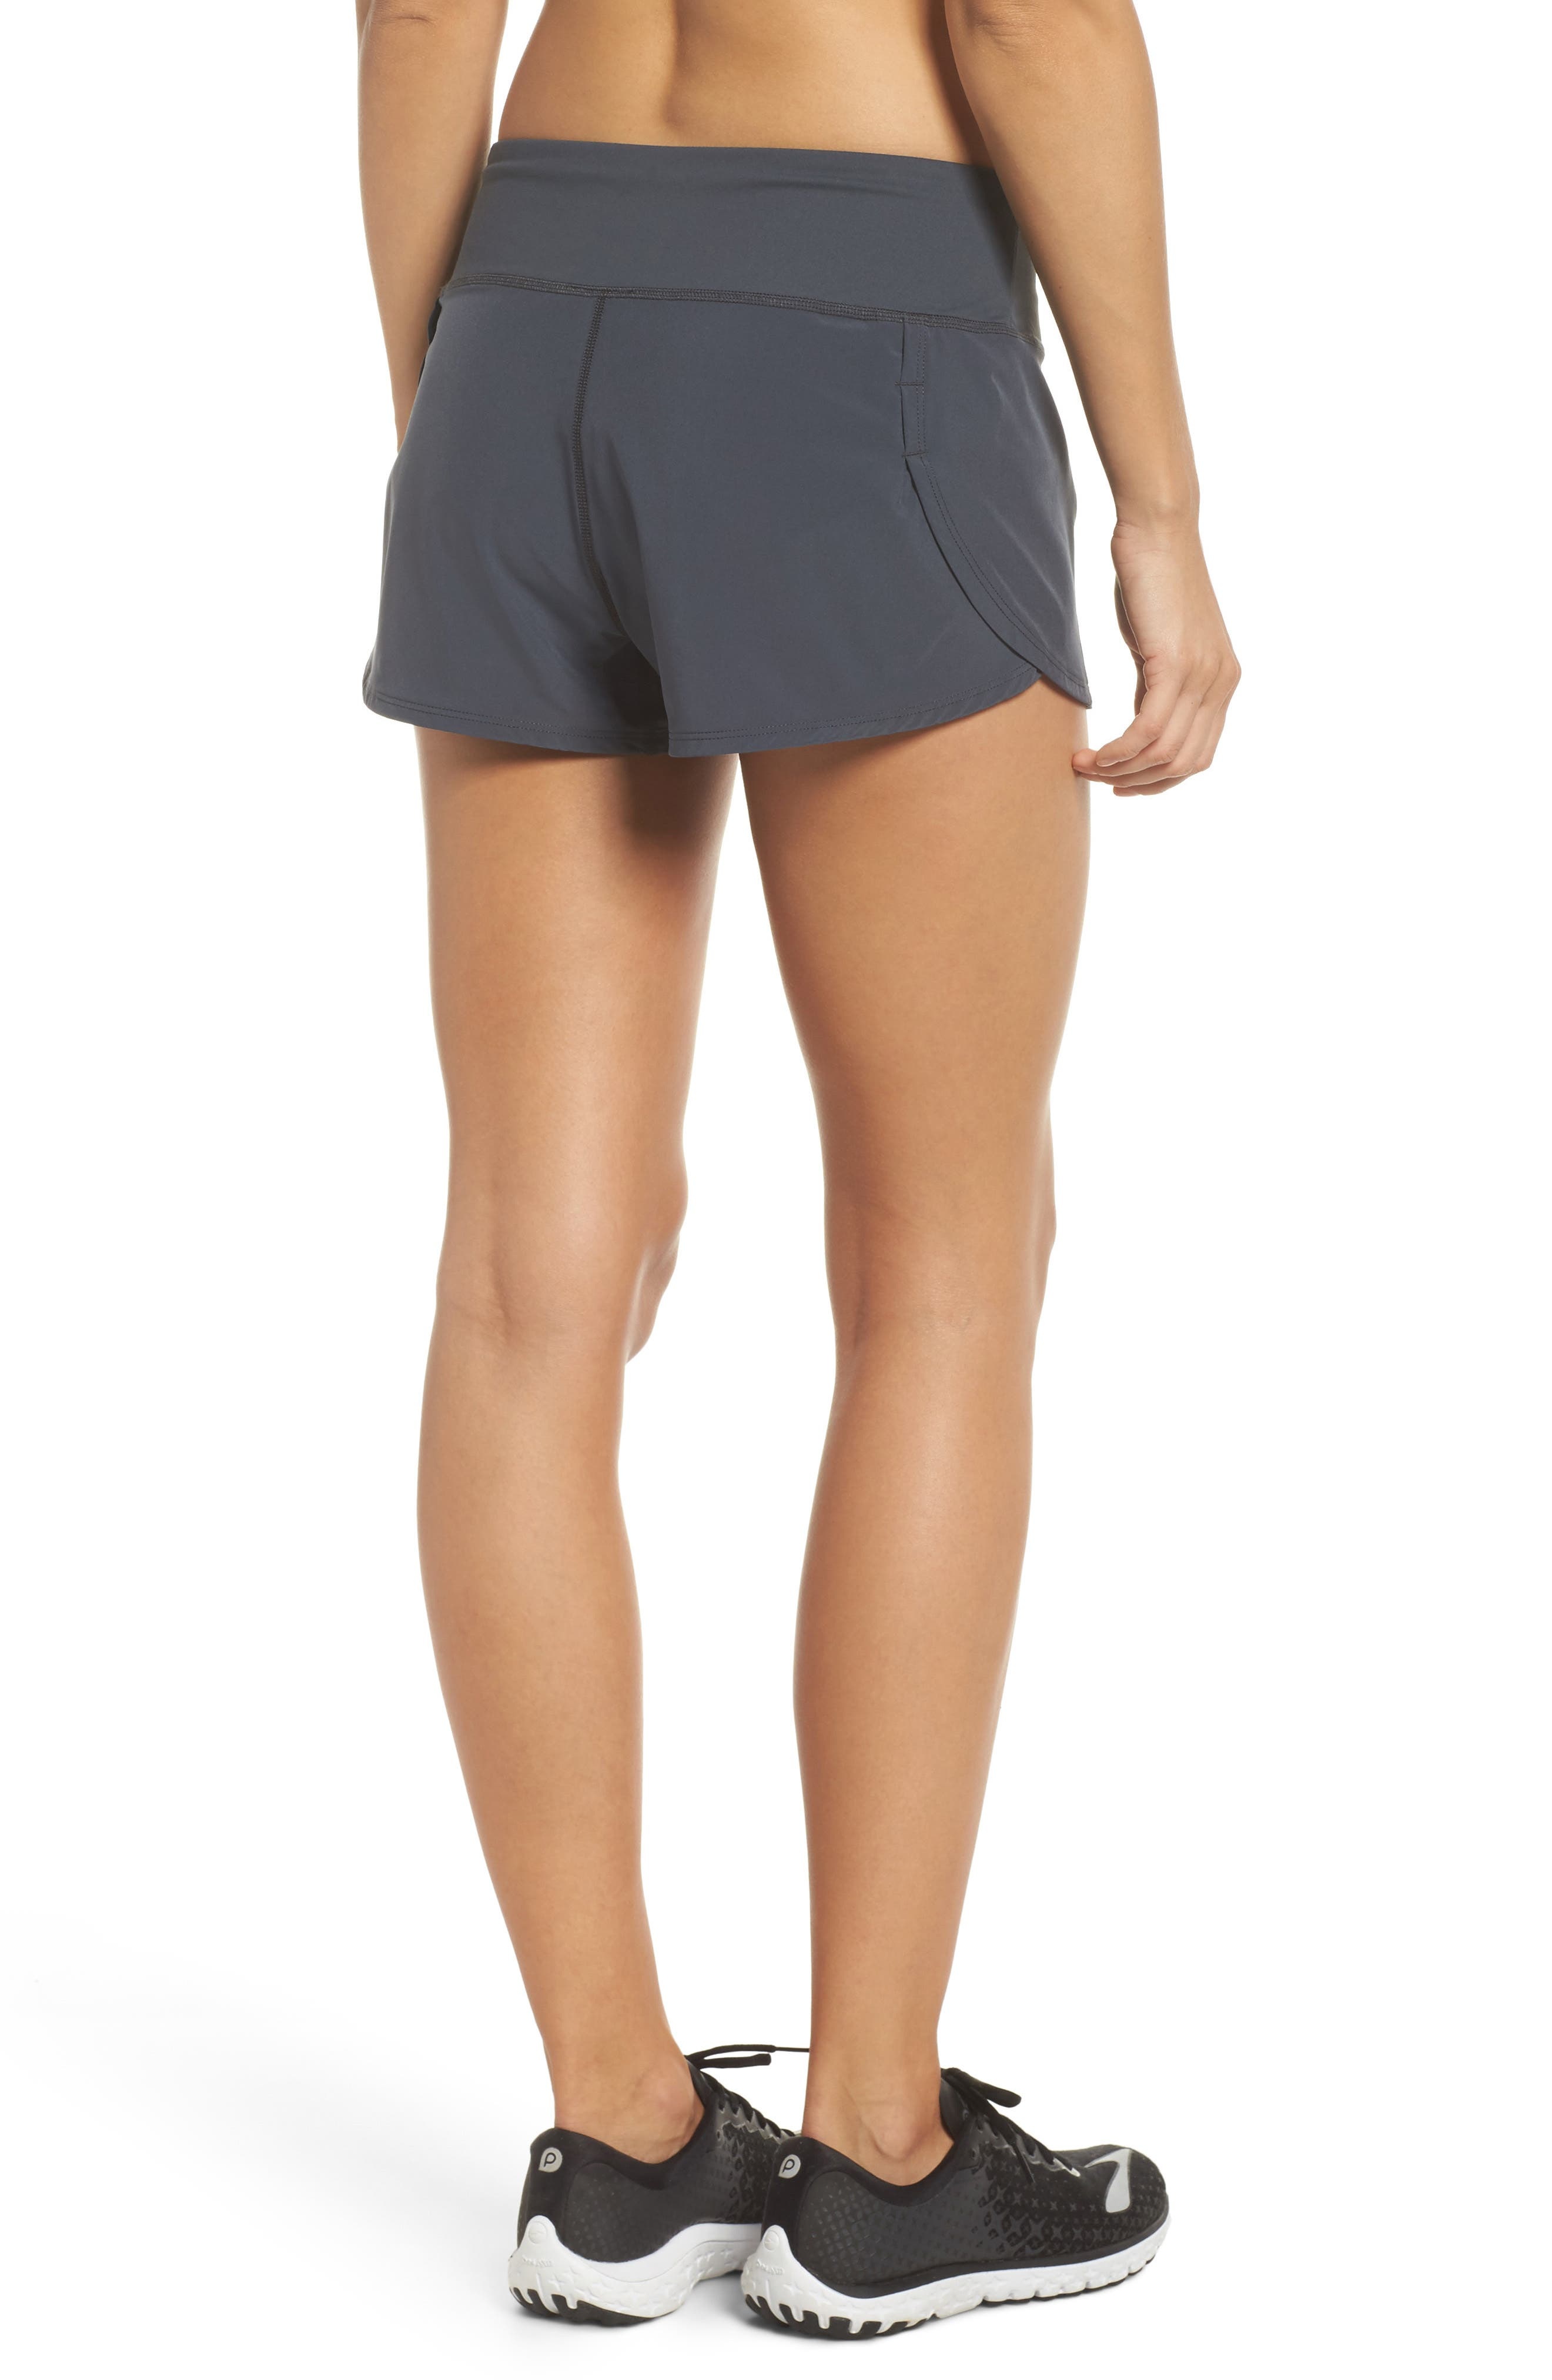 Chaser 3 Shorts,                             Alternate thumbnail 2, color,                             ASPHALT